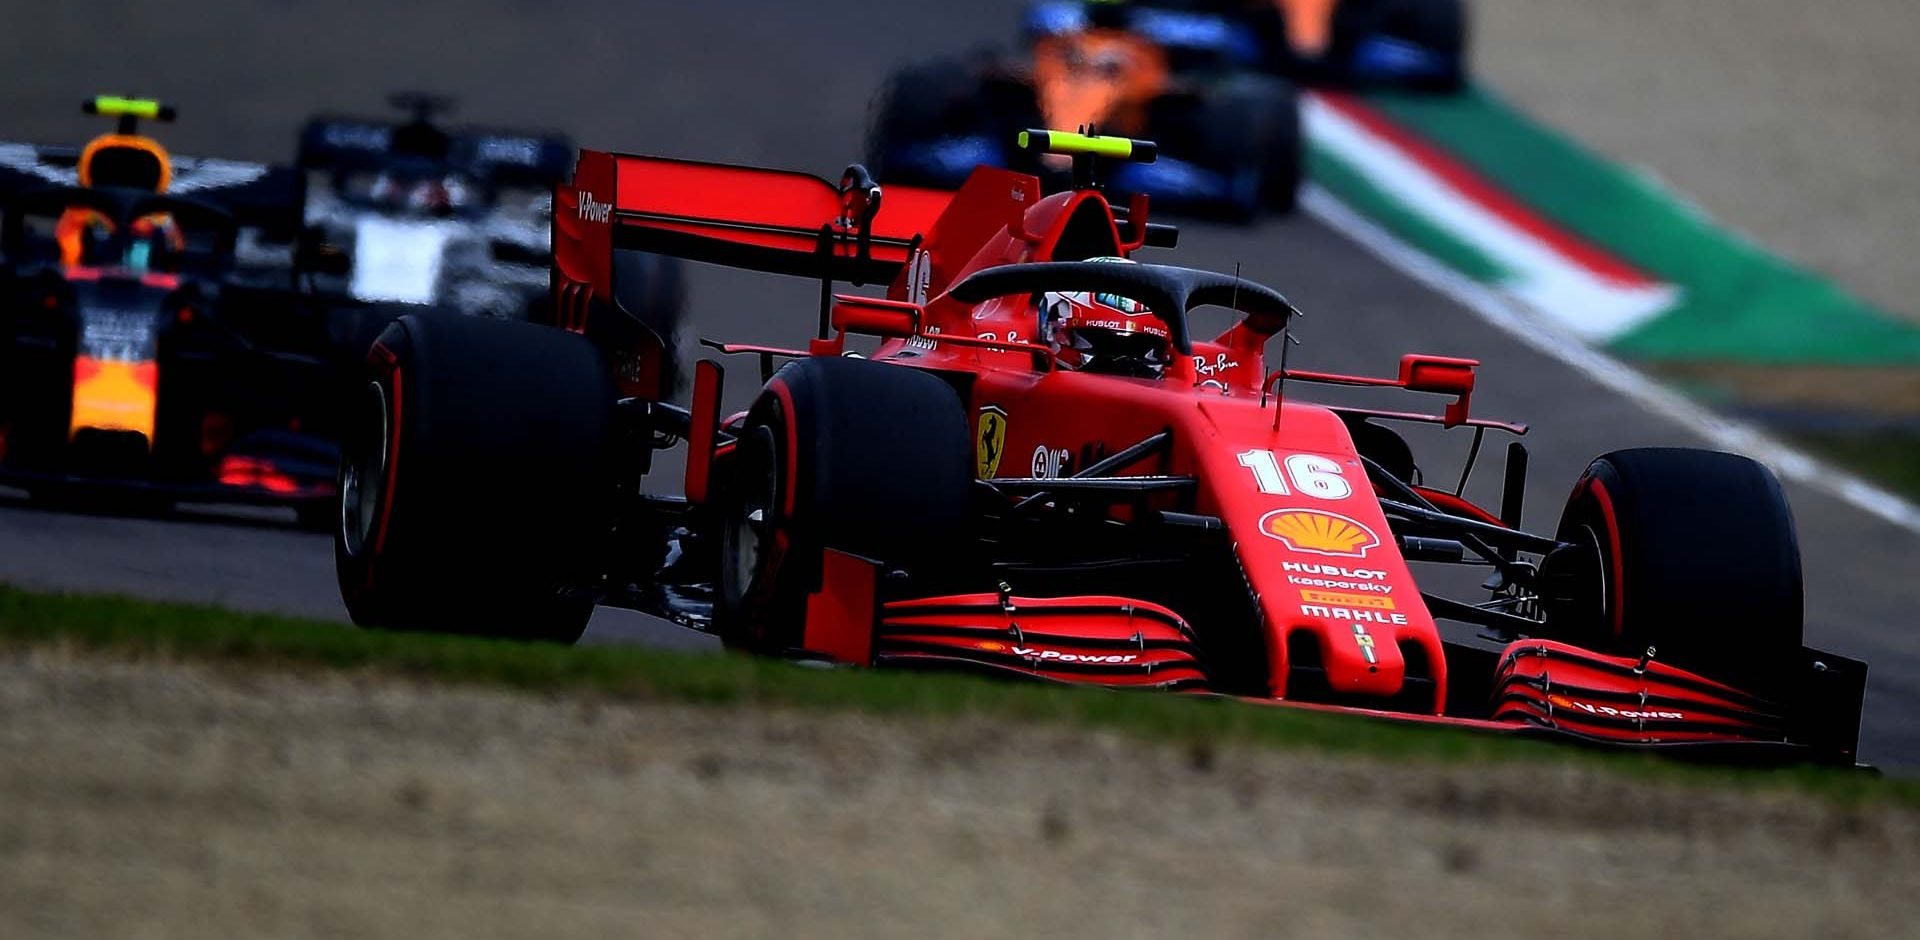 GP EMILIA ROMAGNA F1/2020 -  DOMENICA 01/11/2020   credit: @Scuderia Ferrari Press Office Charles Leclerc